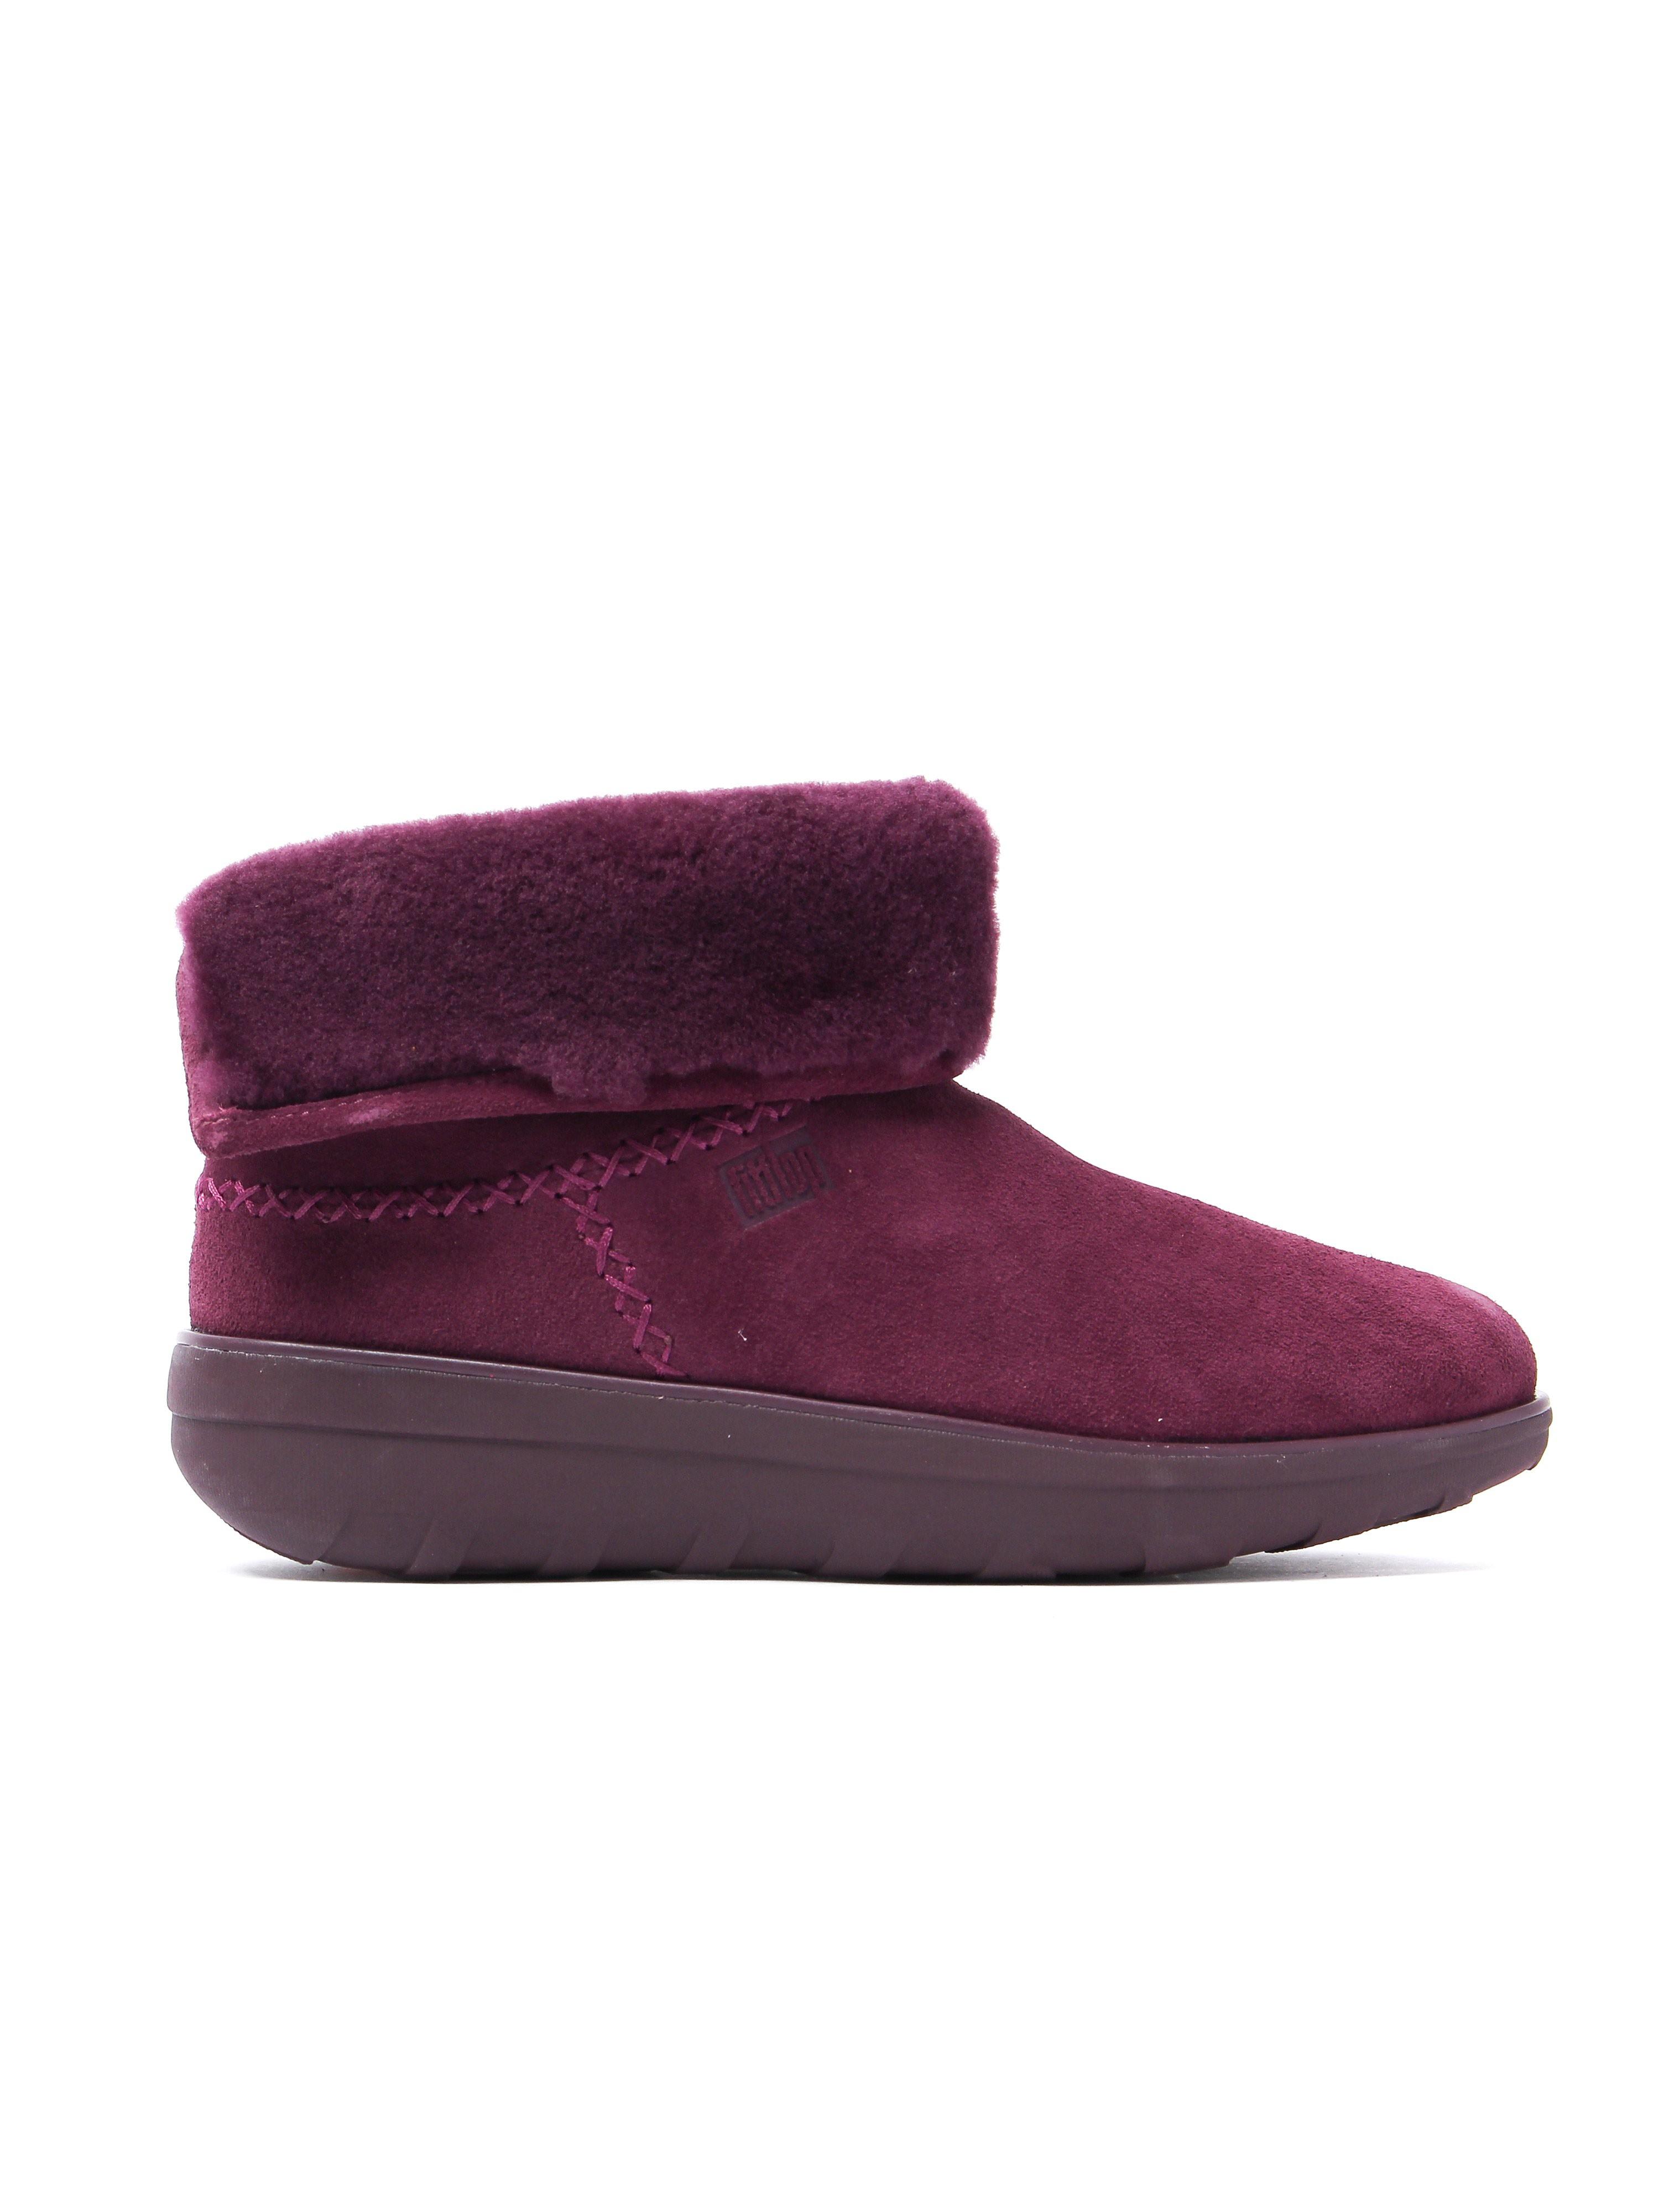 FitFlop Women's Mukluk Shorty 2 Boots - Deep Plum Suede